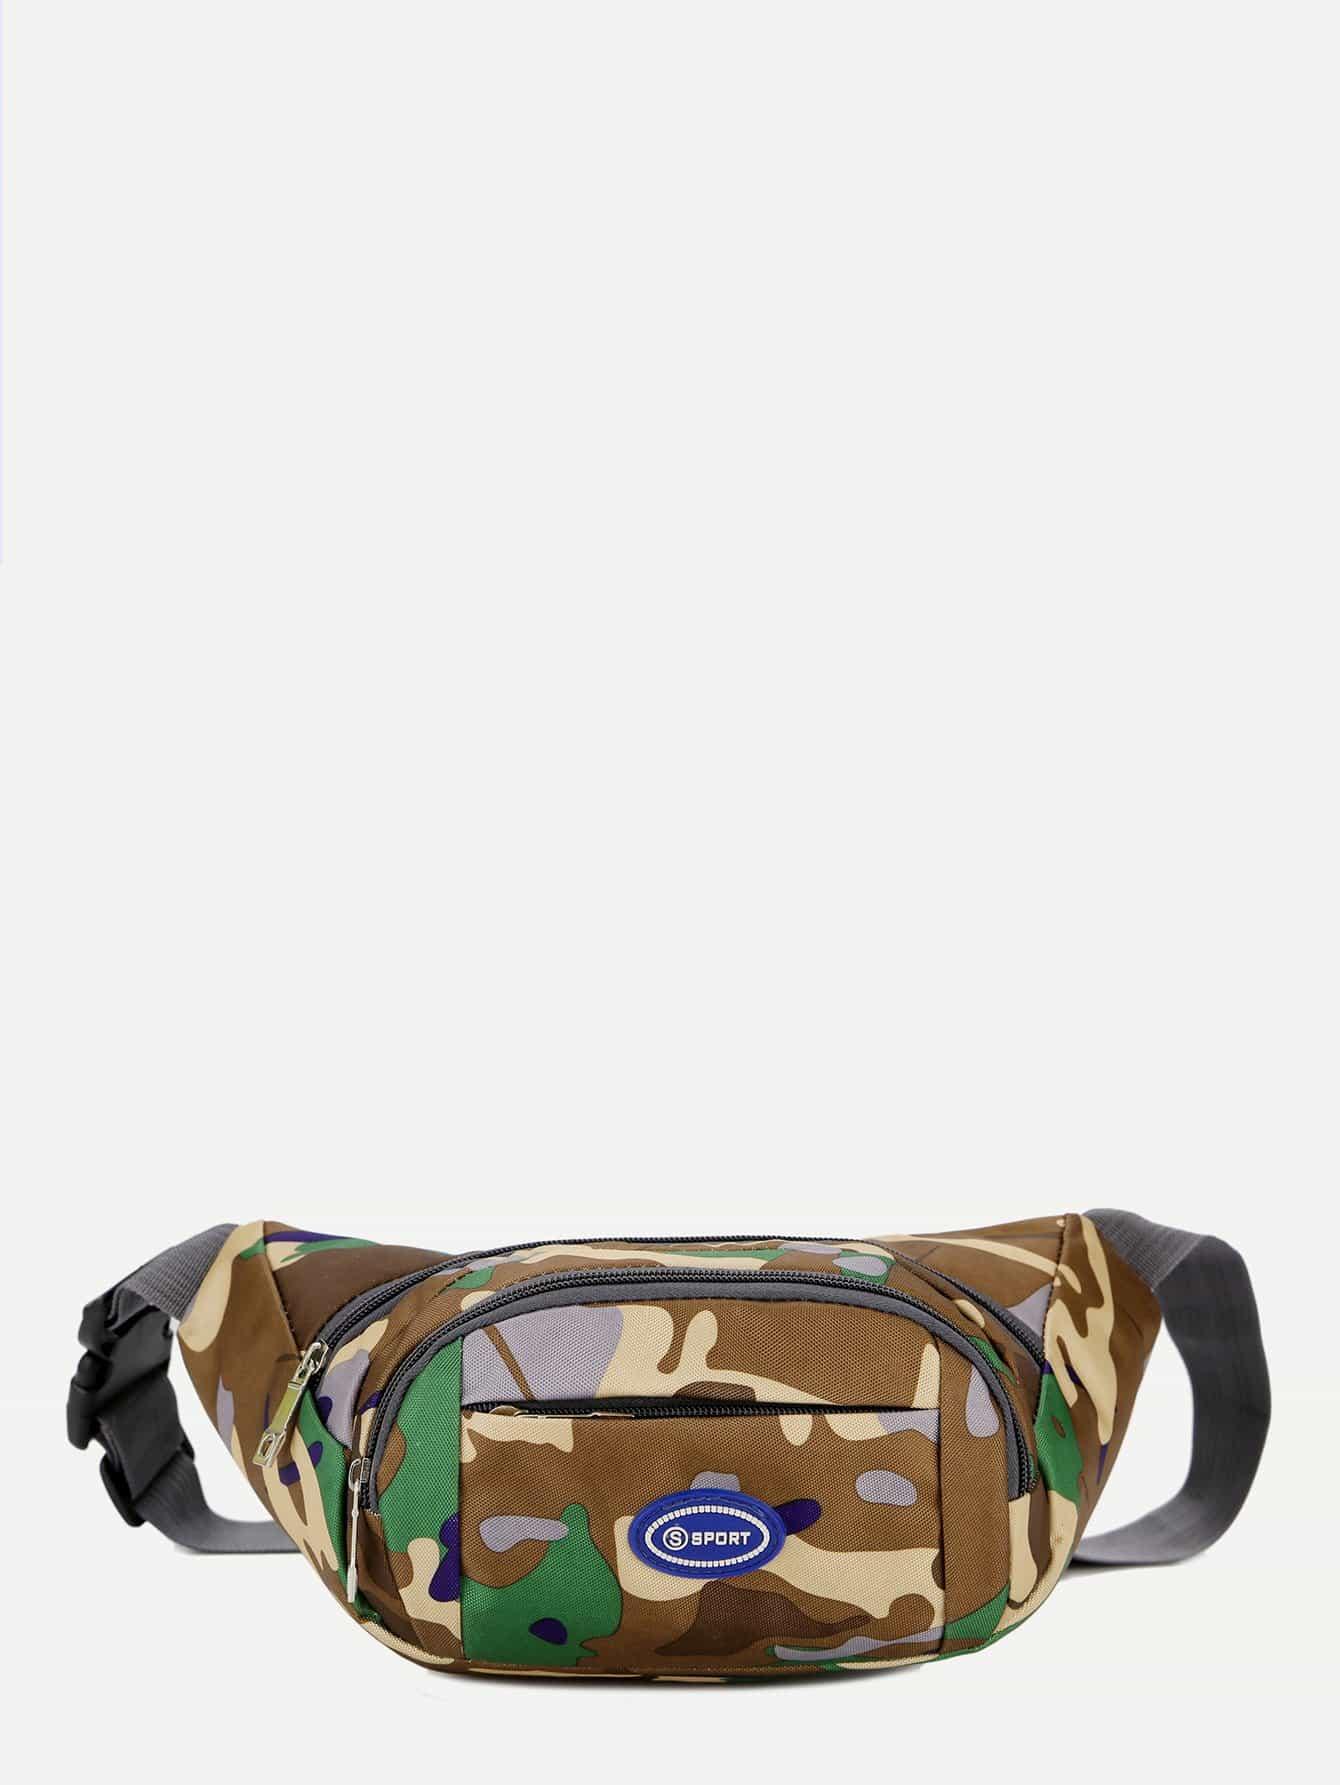 Camouflage Detail Bum Bag camouflage detail bum bag